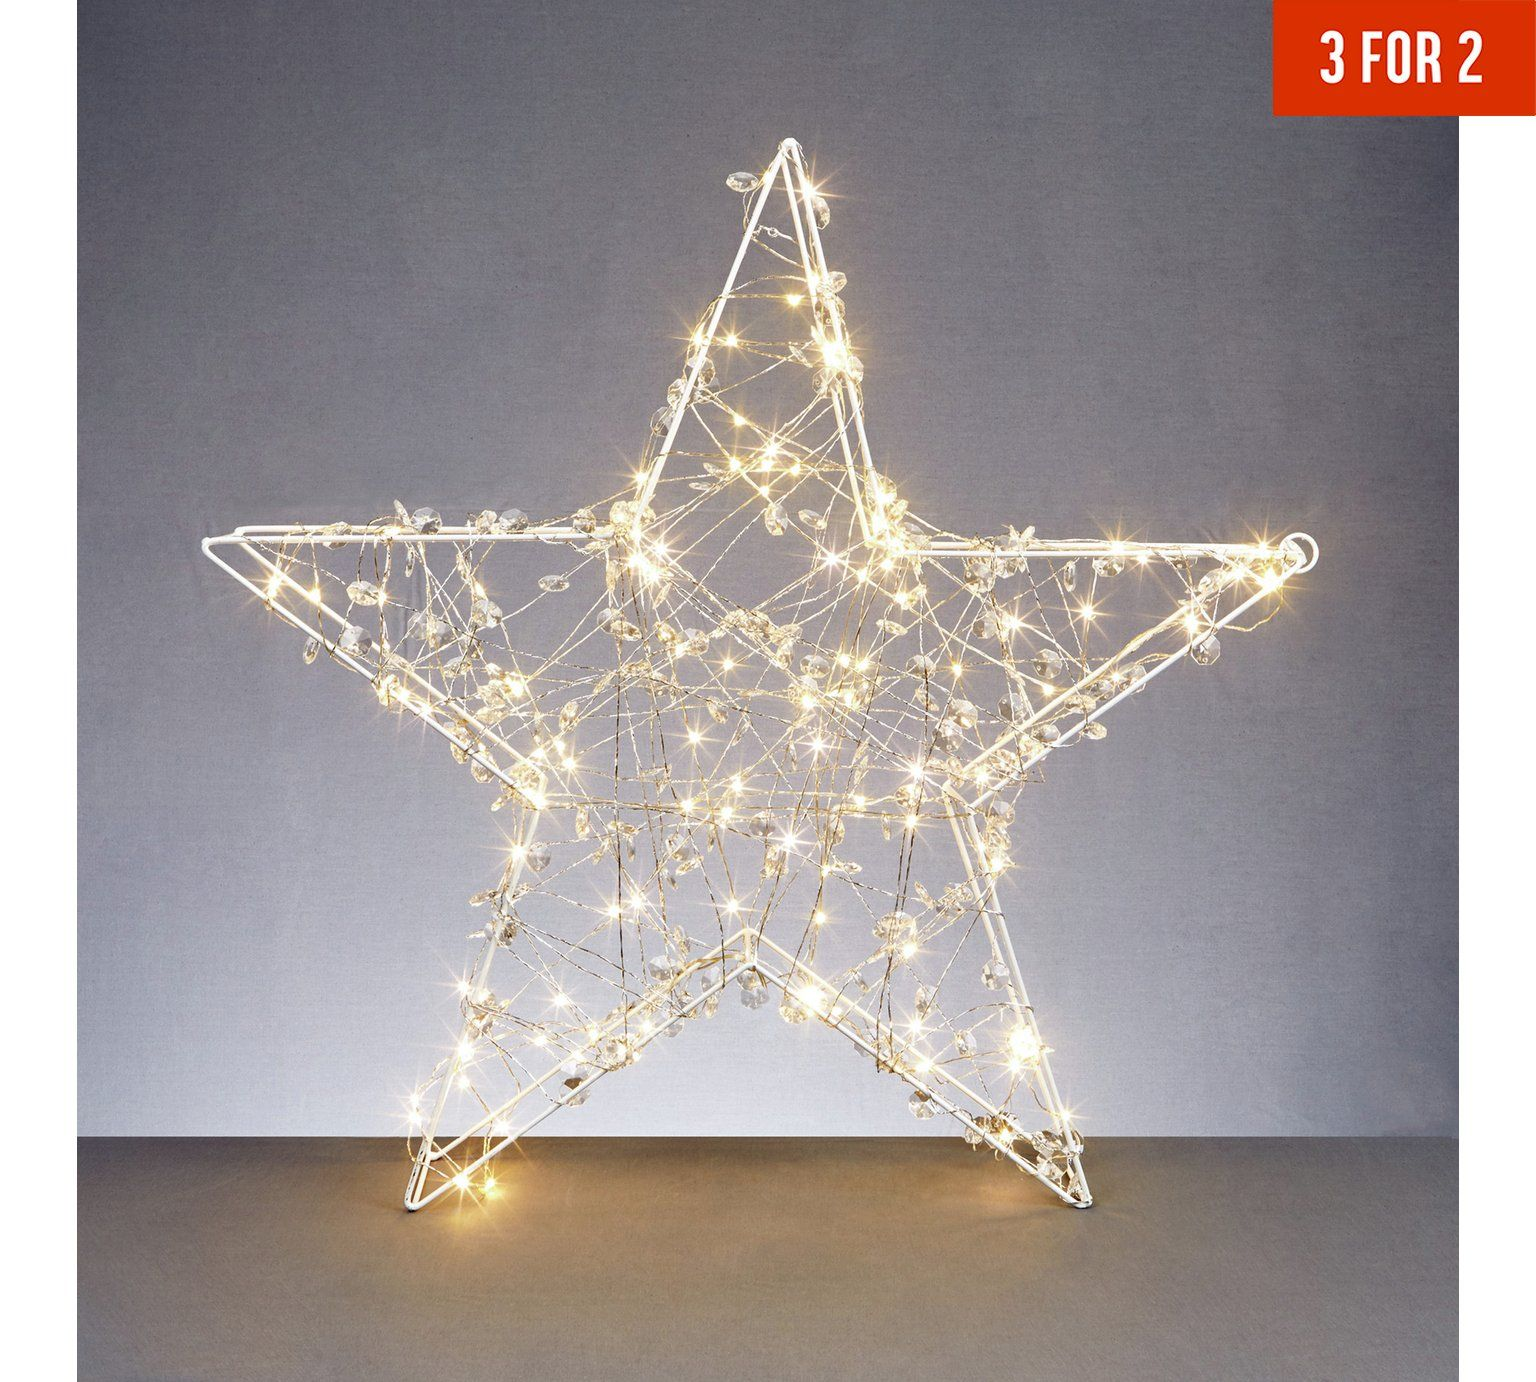 Buy Premier Decorations 1x1m 300 Led Copper Star Light